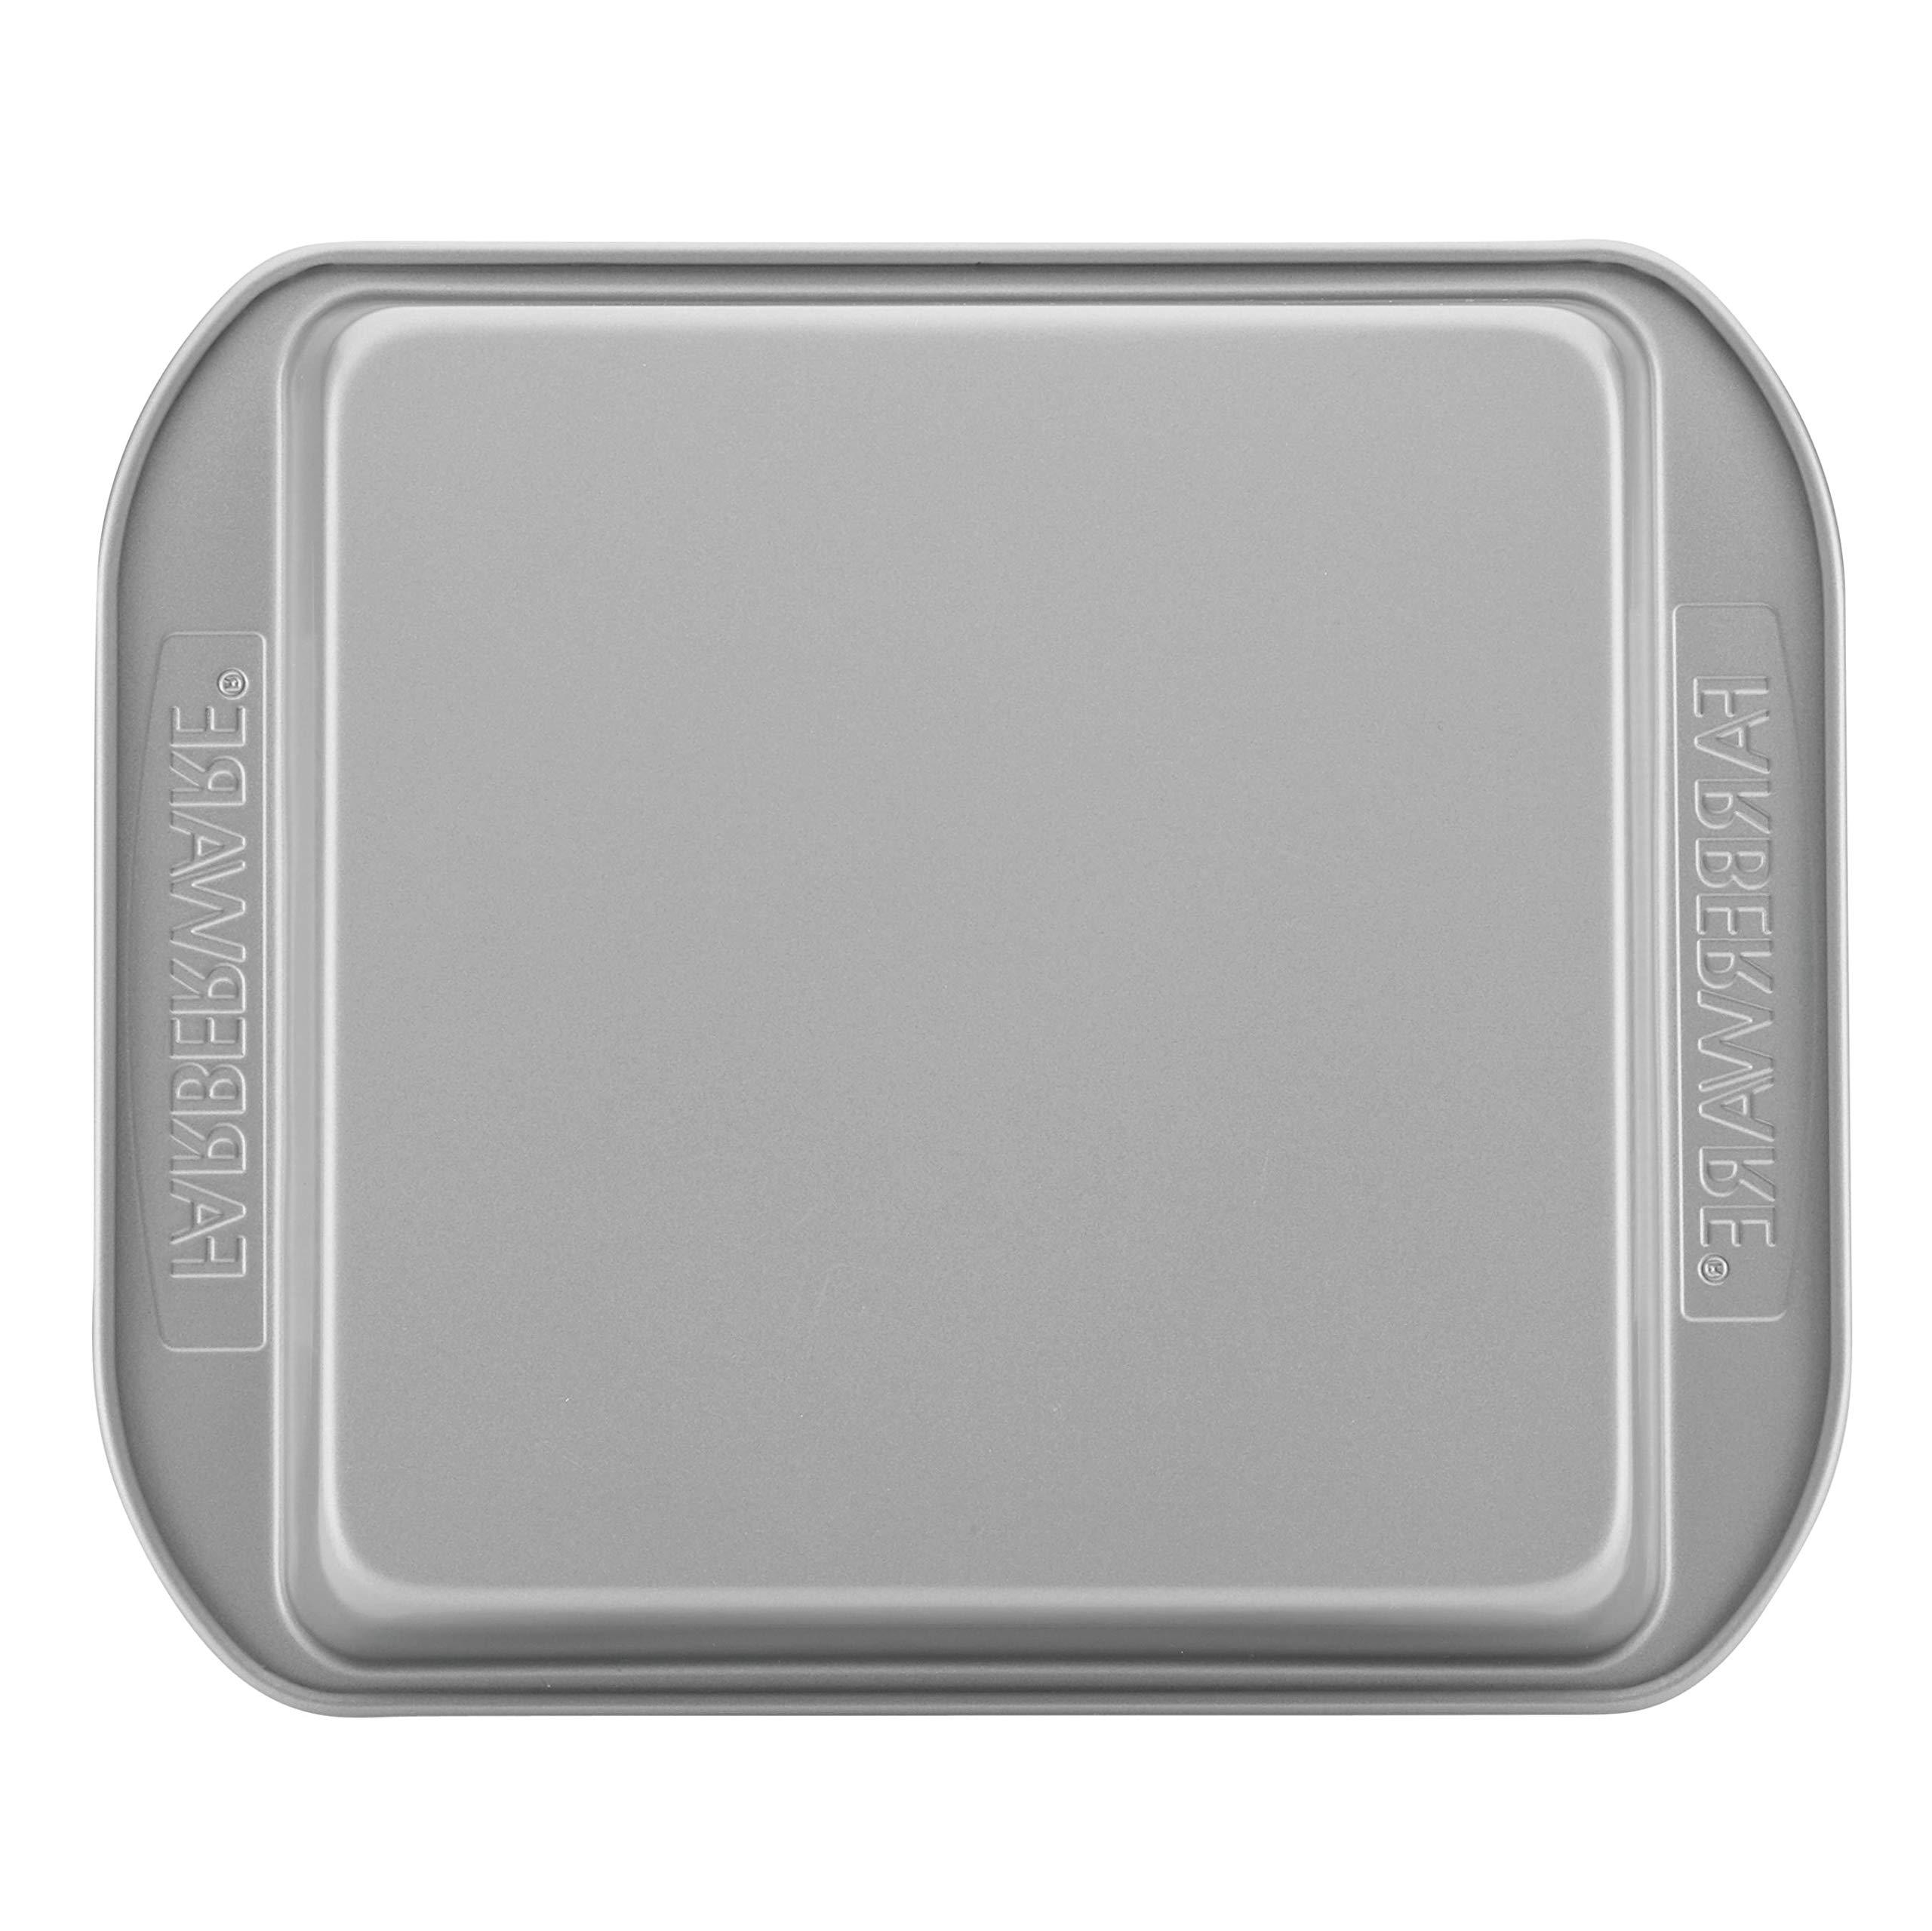 Farberware 47744 2-Piece Rectangular Set Steel Cake Pan, Gray by Farberware (Image #3)